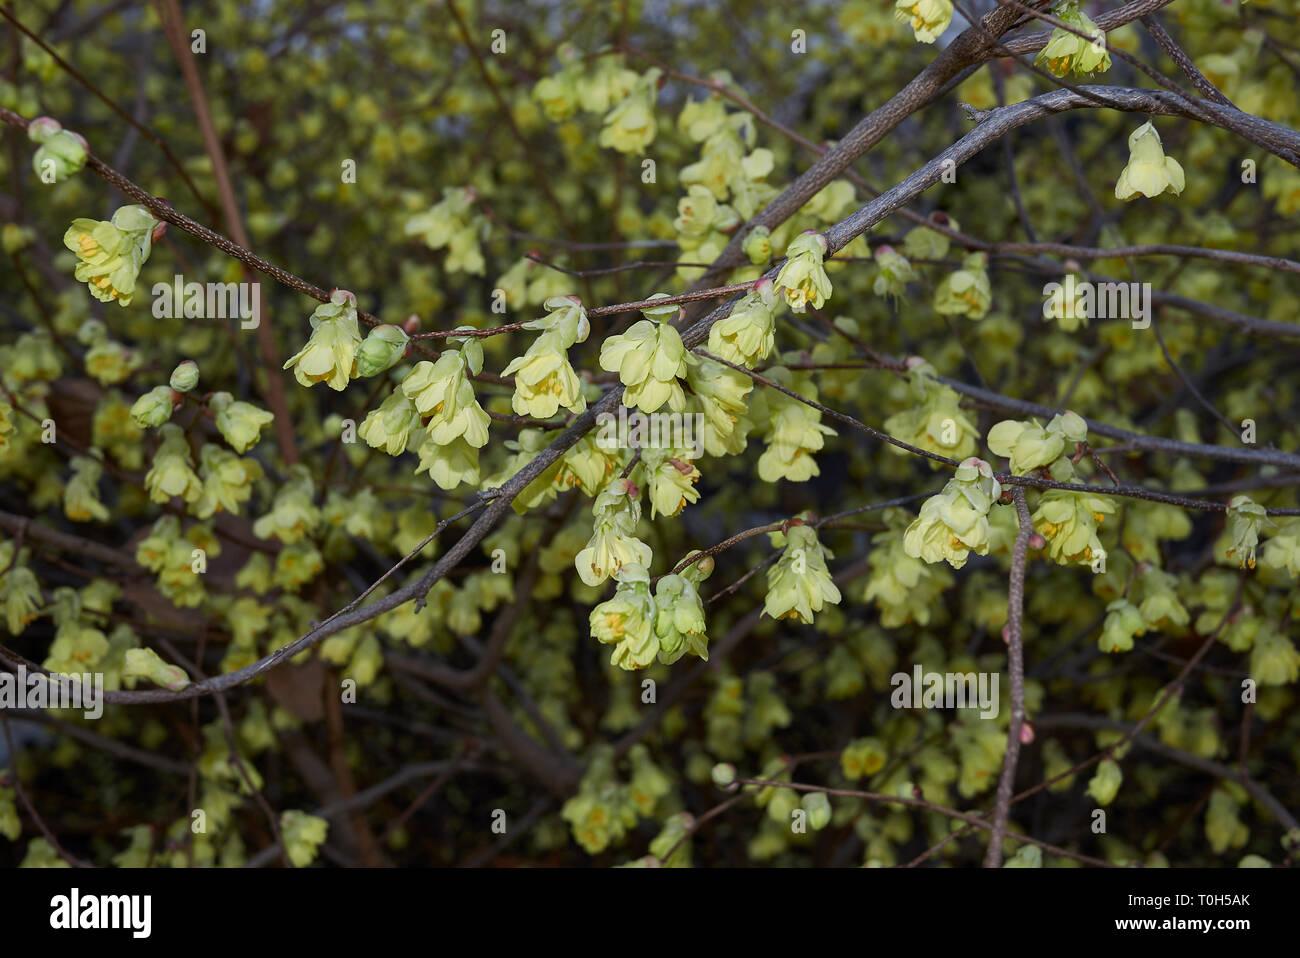 yellow flowers of Corylopsis pauciflora shrub - Stock Image